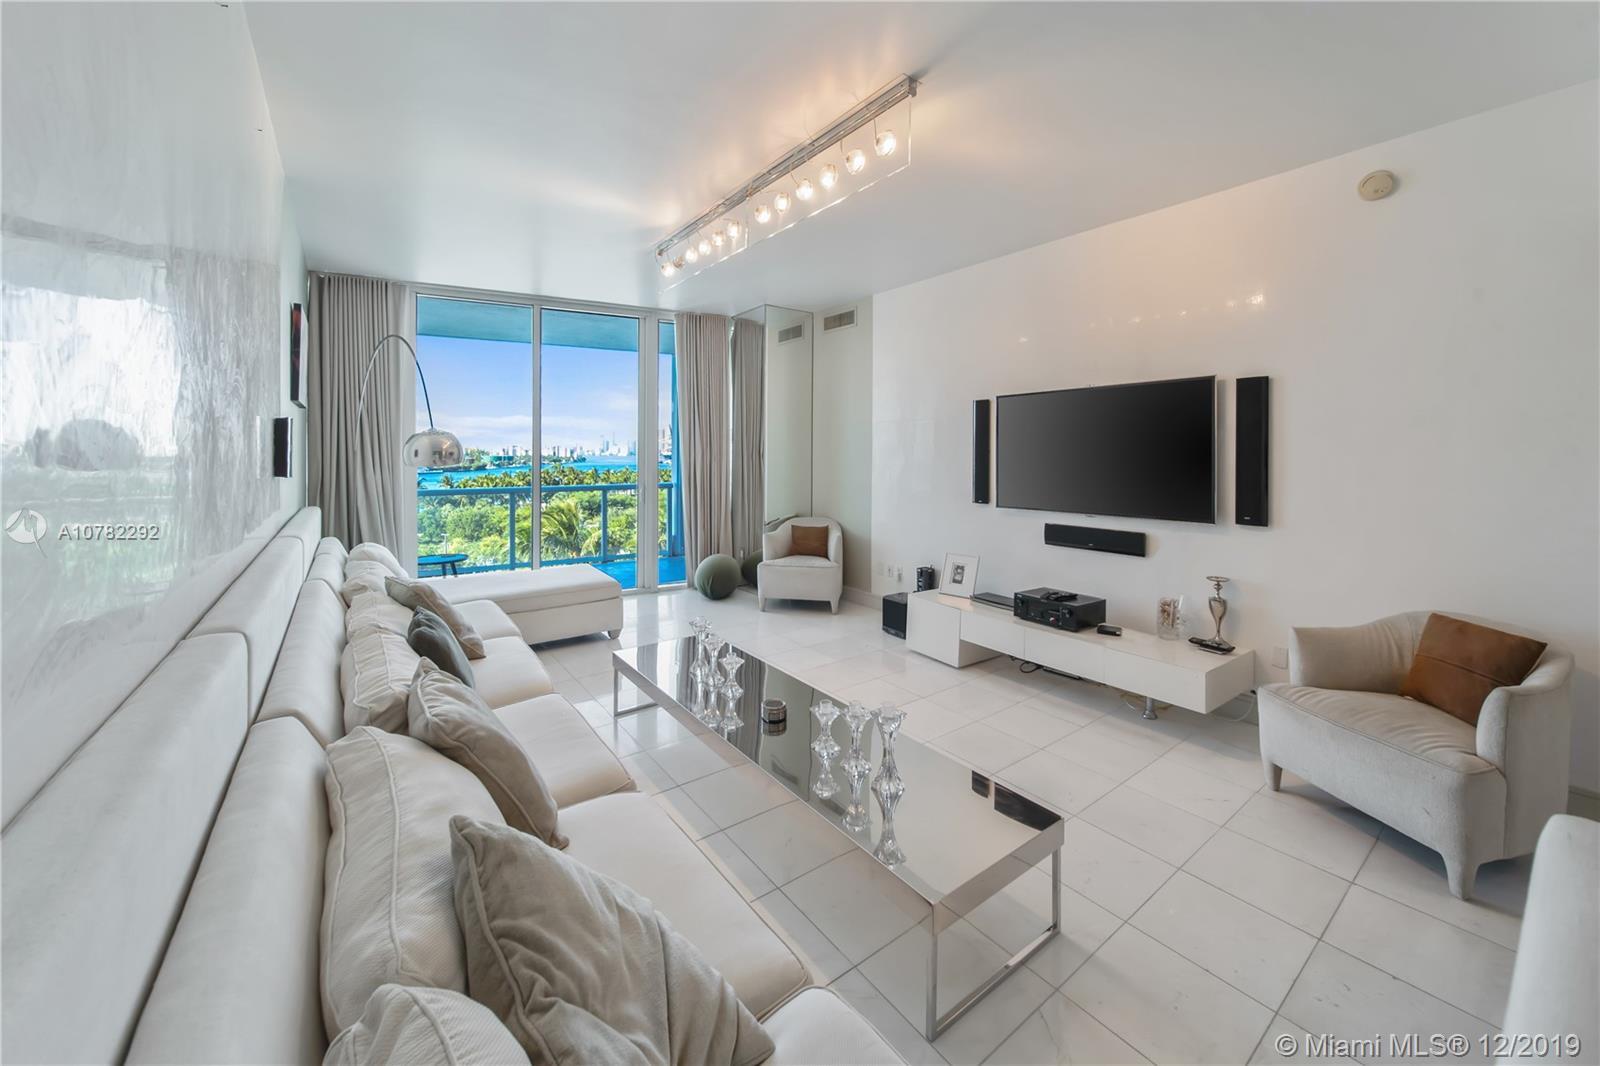 100 S Pointe Dr #602, Miami Beach FL 33139